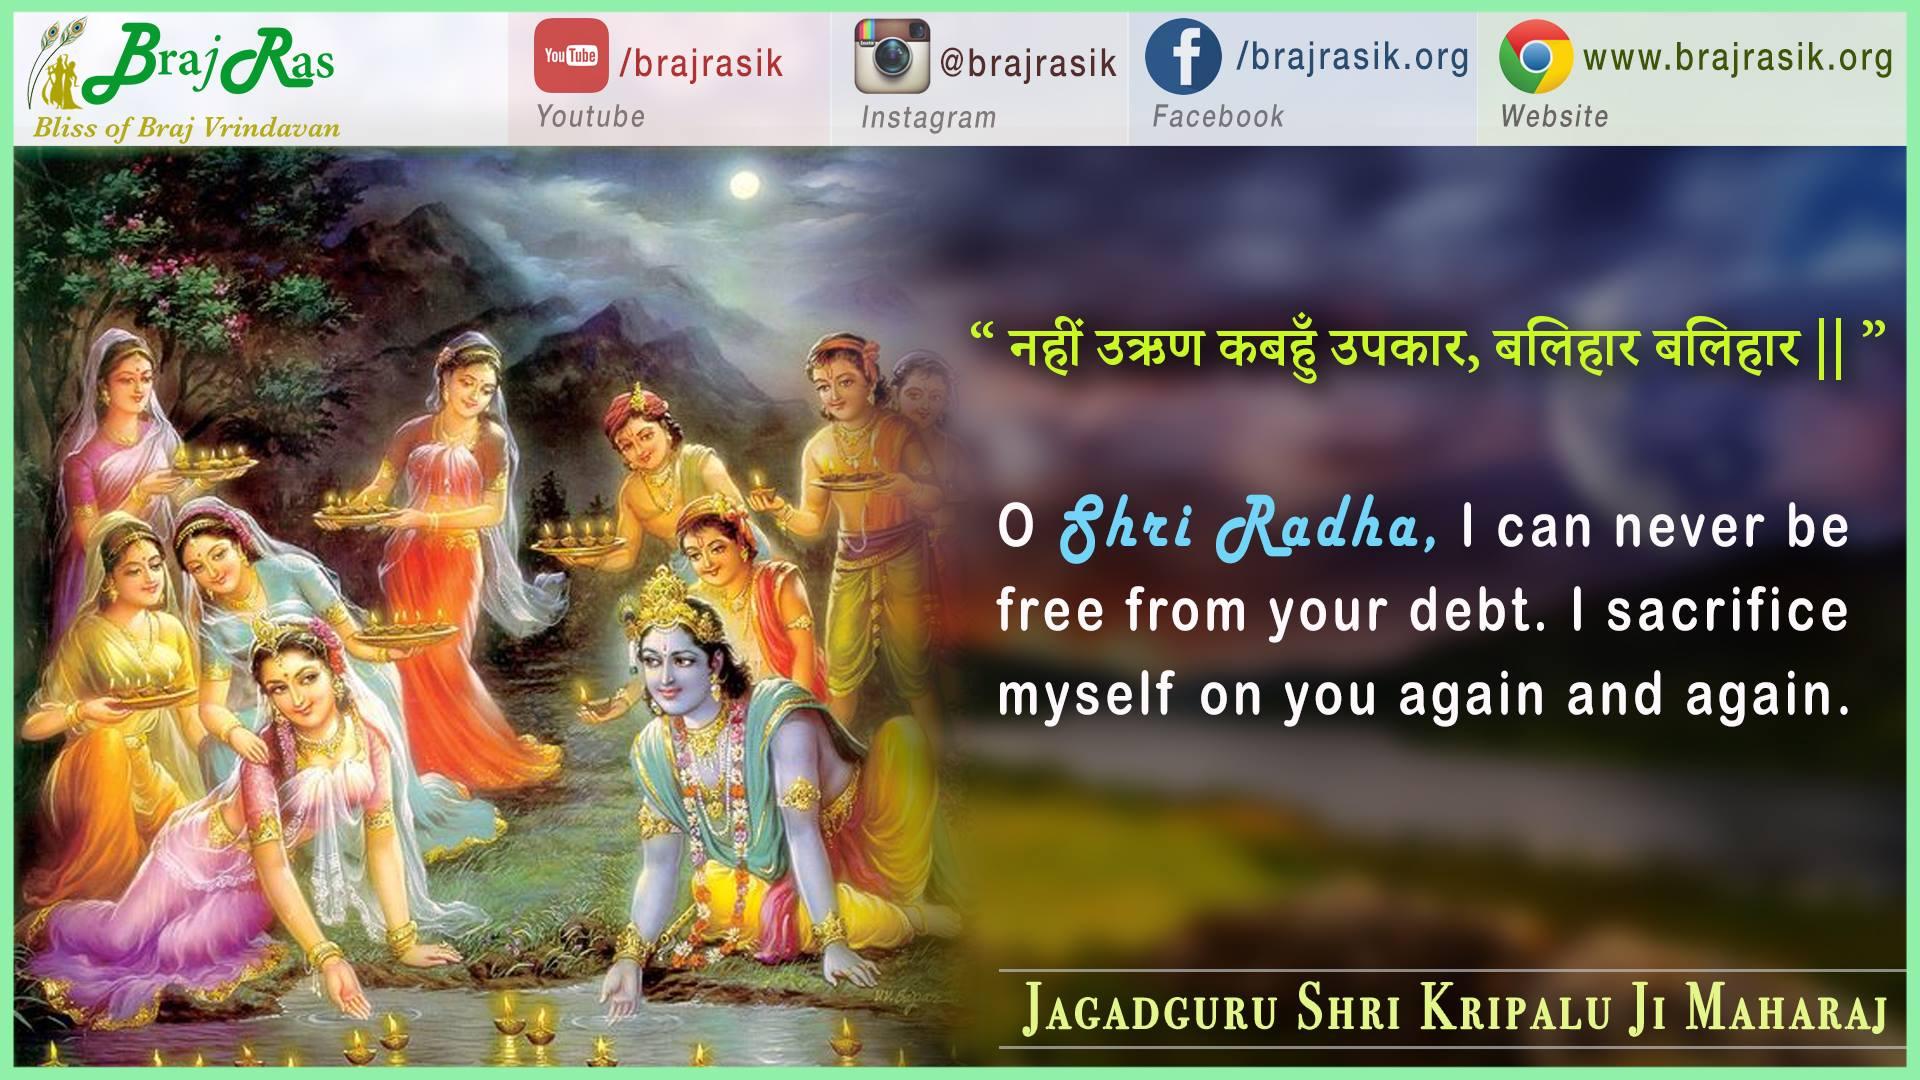 Nahin urina kabahun upakaar - Jagadguru Shri Kripalu Ji Maharaj